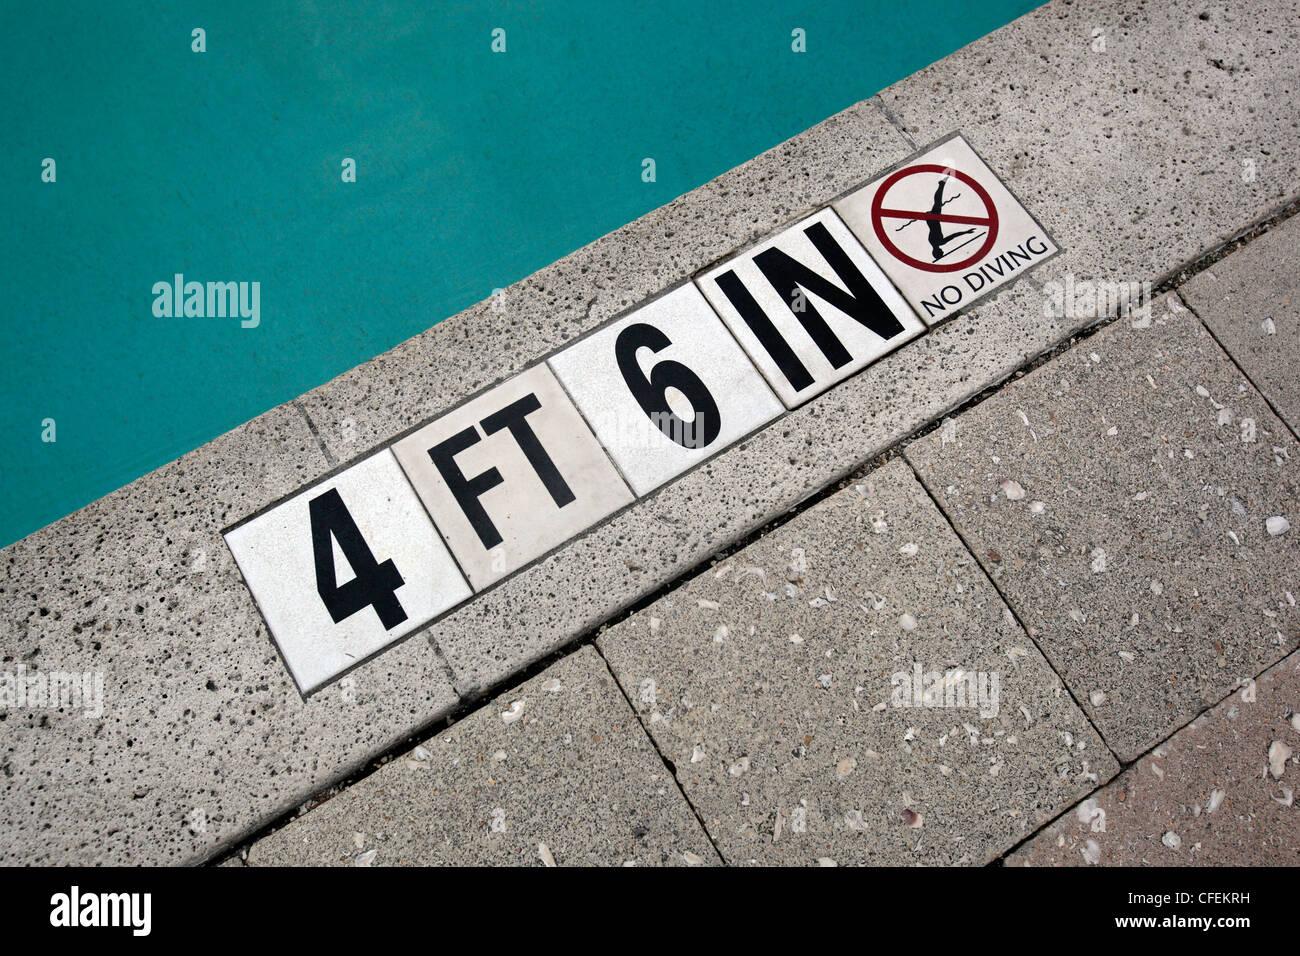 swimming pool depth numbers - Stock Image